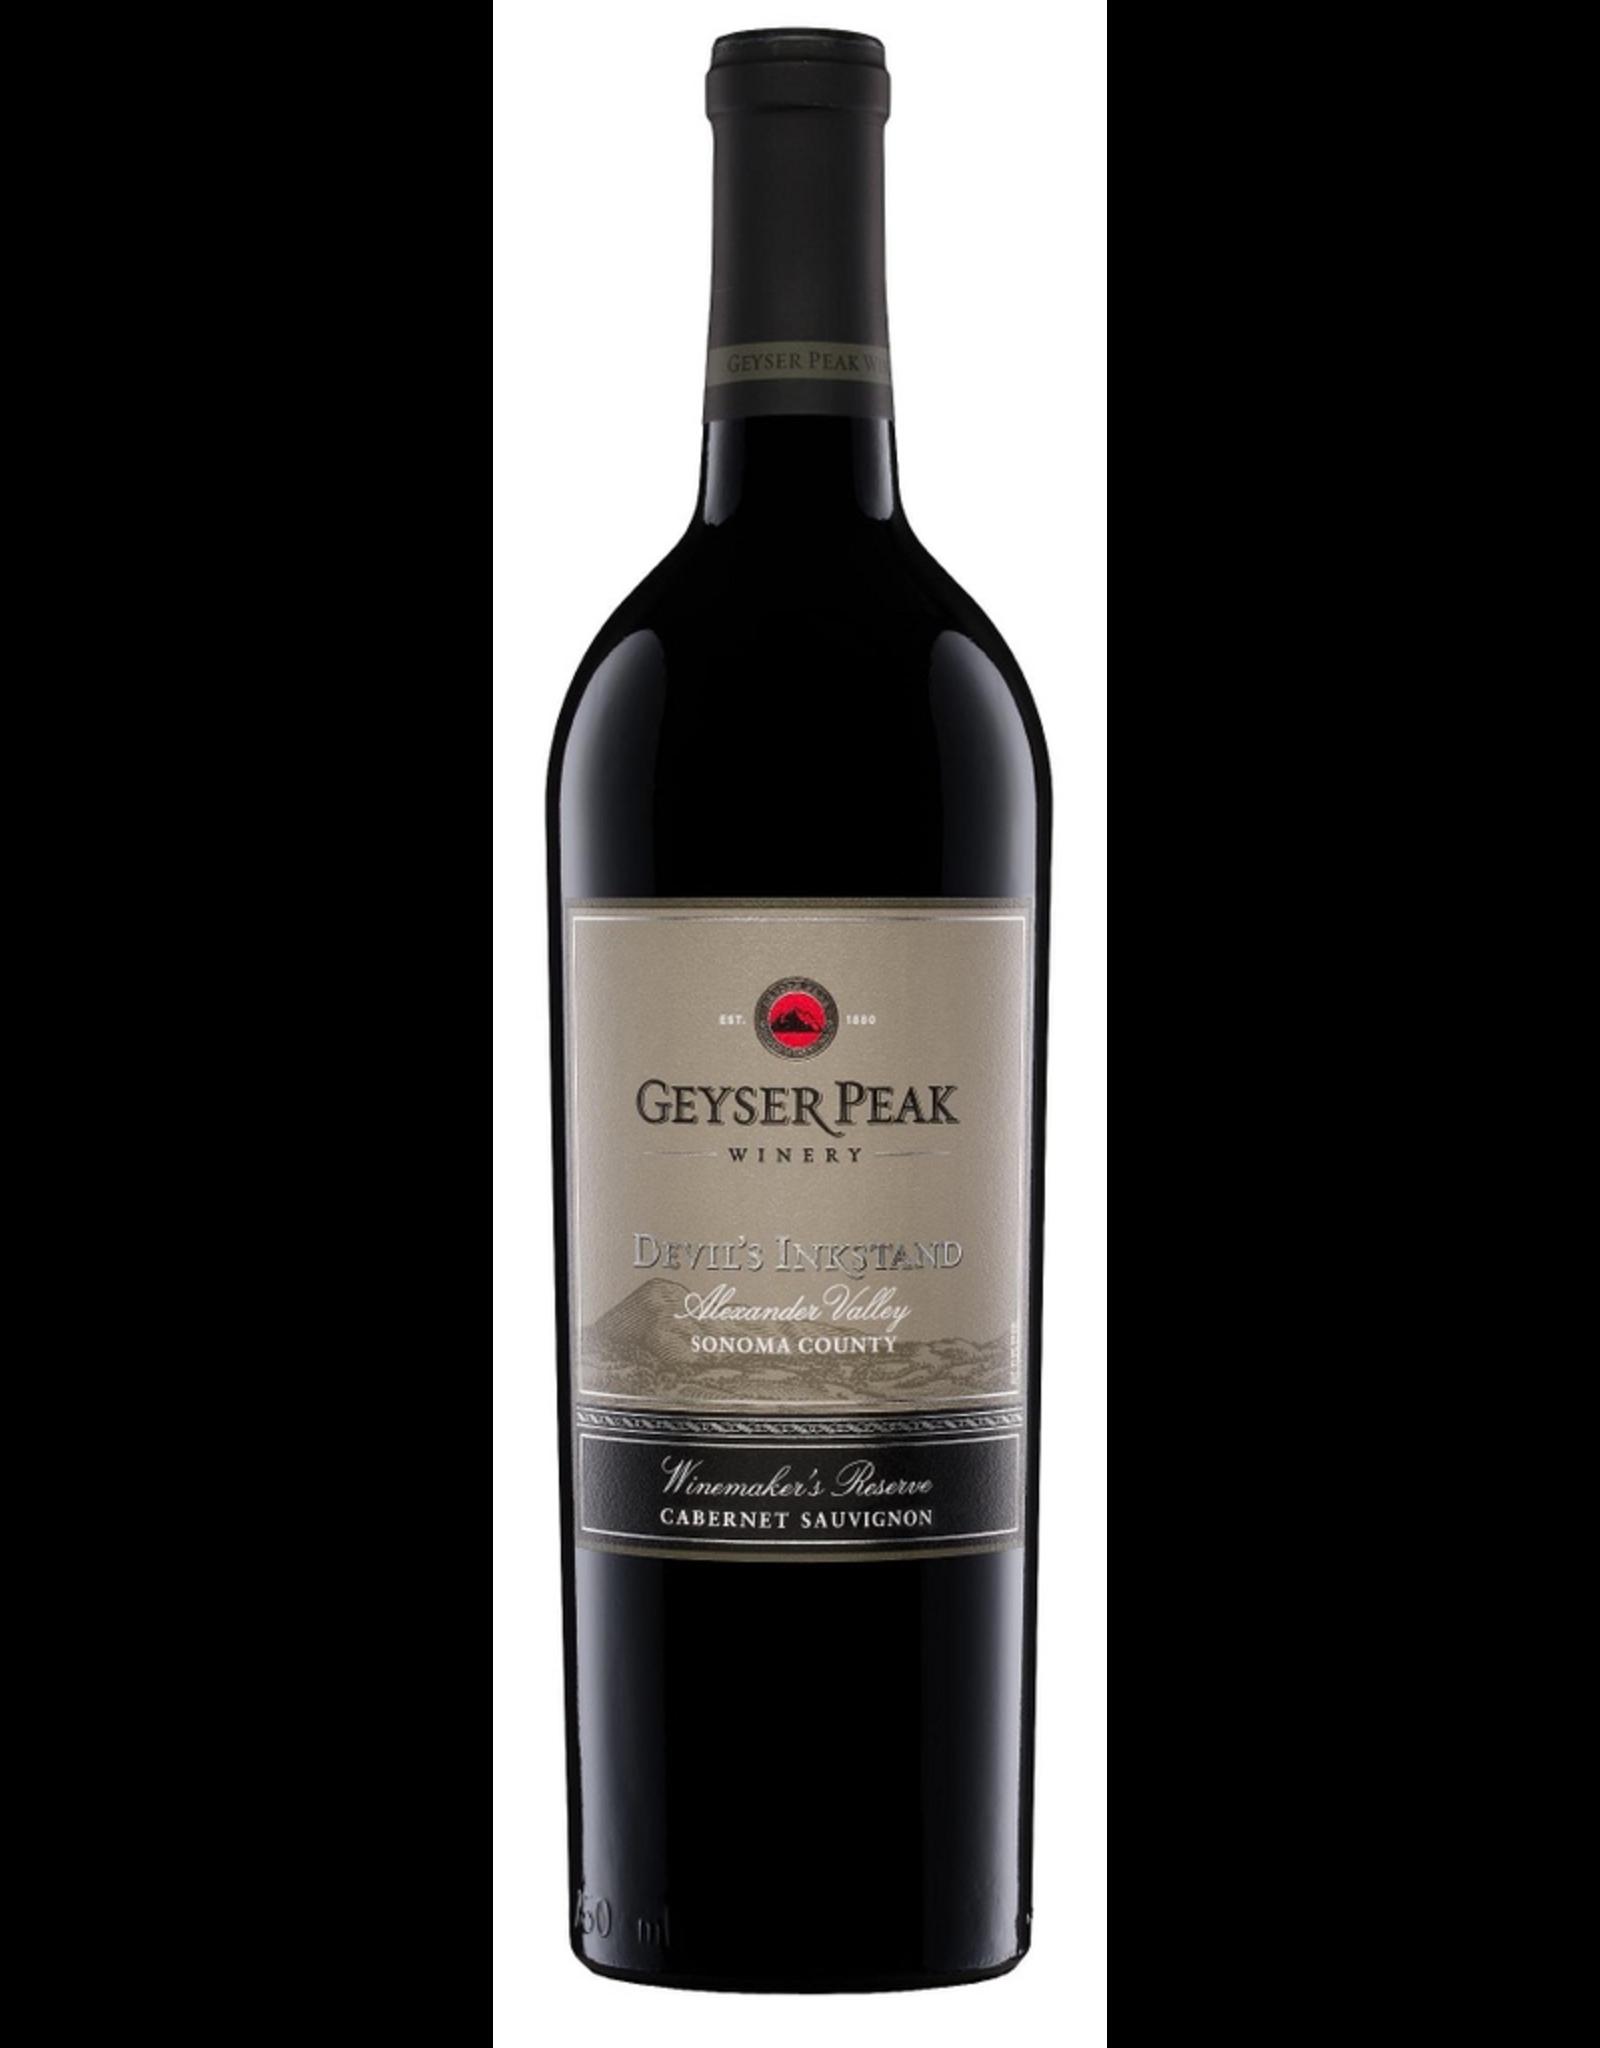 Red Wine 2012, Geyser Peak Devils Inkstand Reserve, Cabernet Sauvignon, Alexander Valley, Sonoma County, California, 14% Alc, CT87, TW90